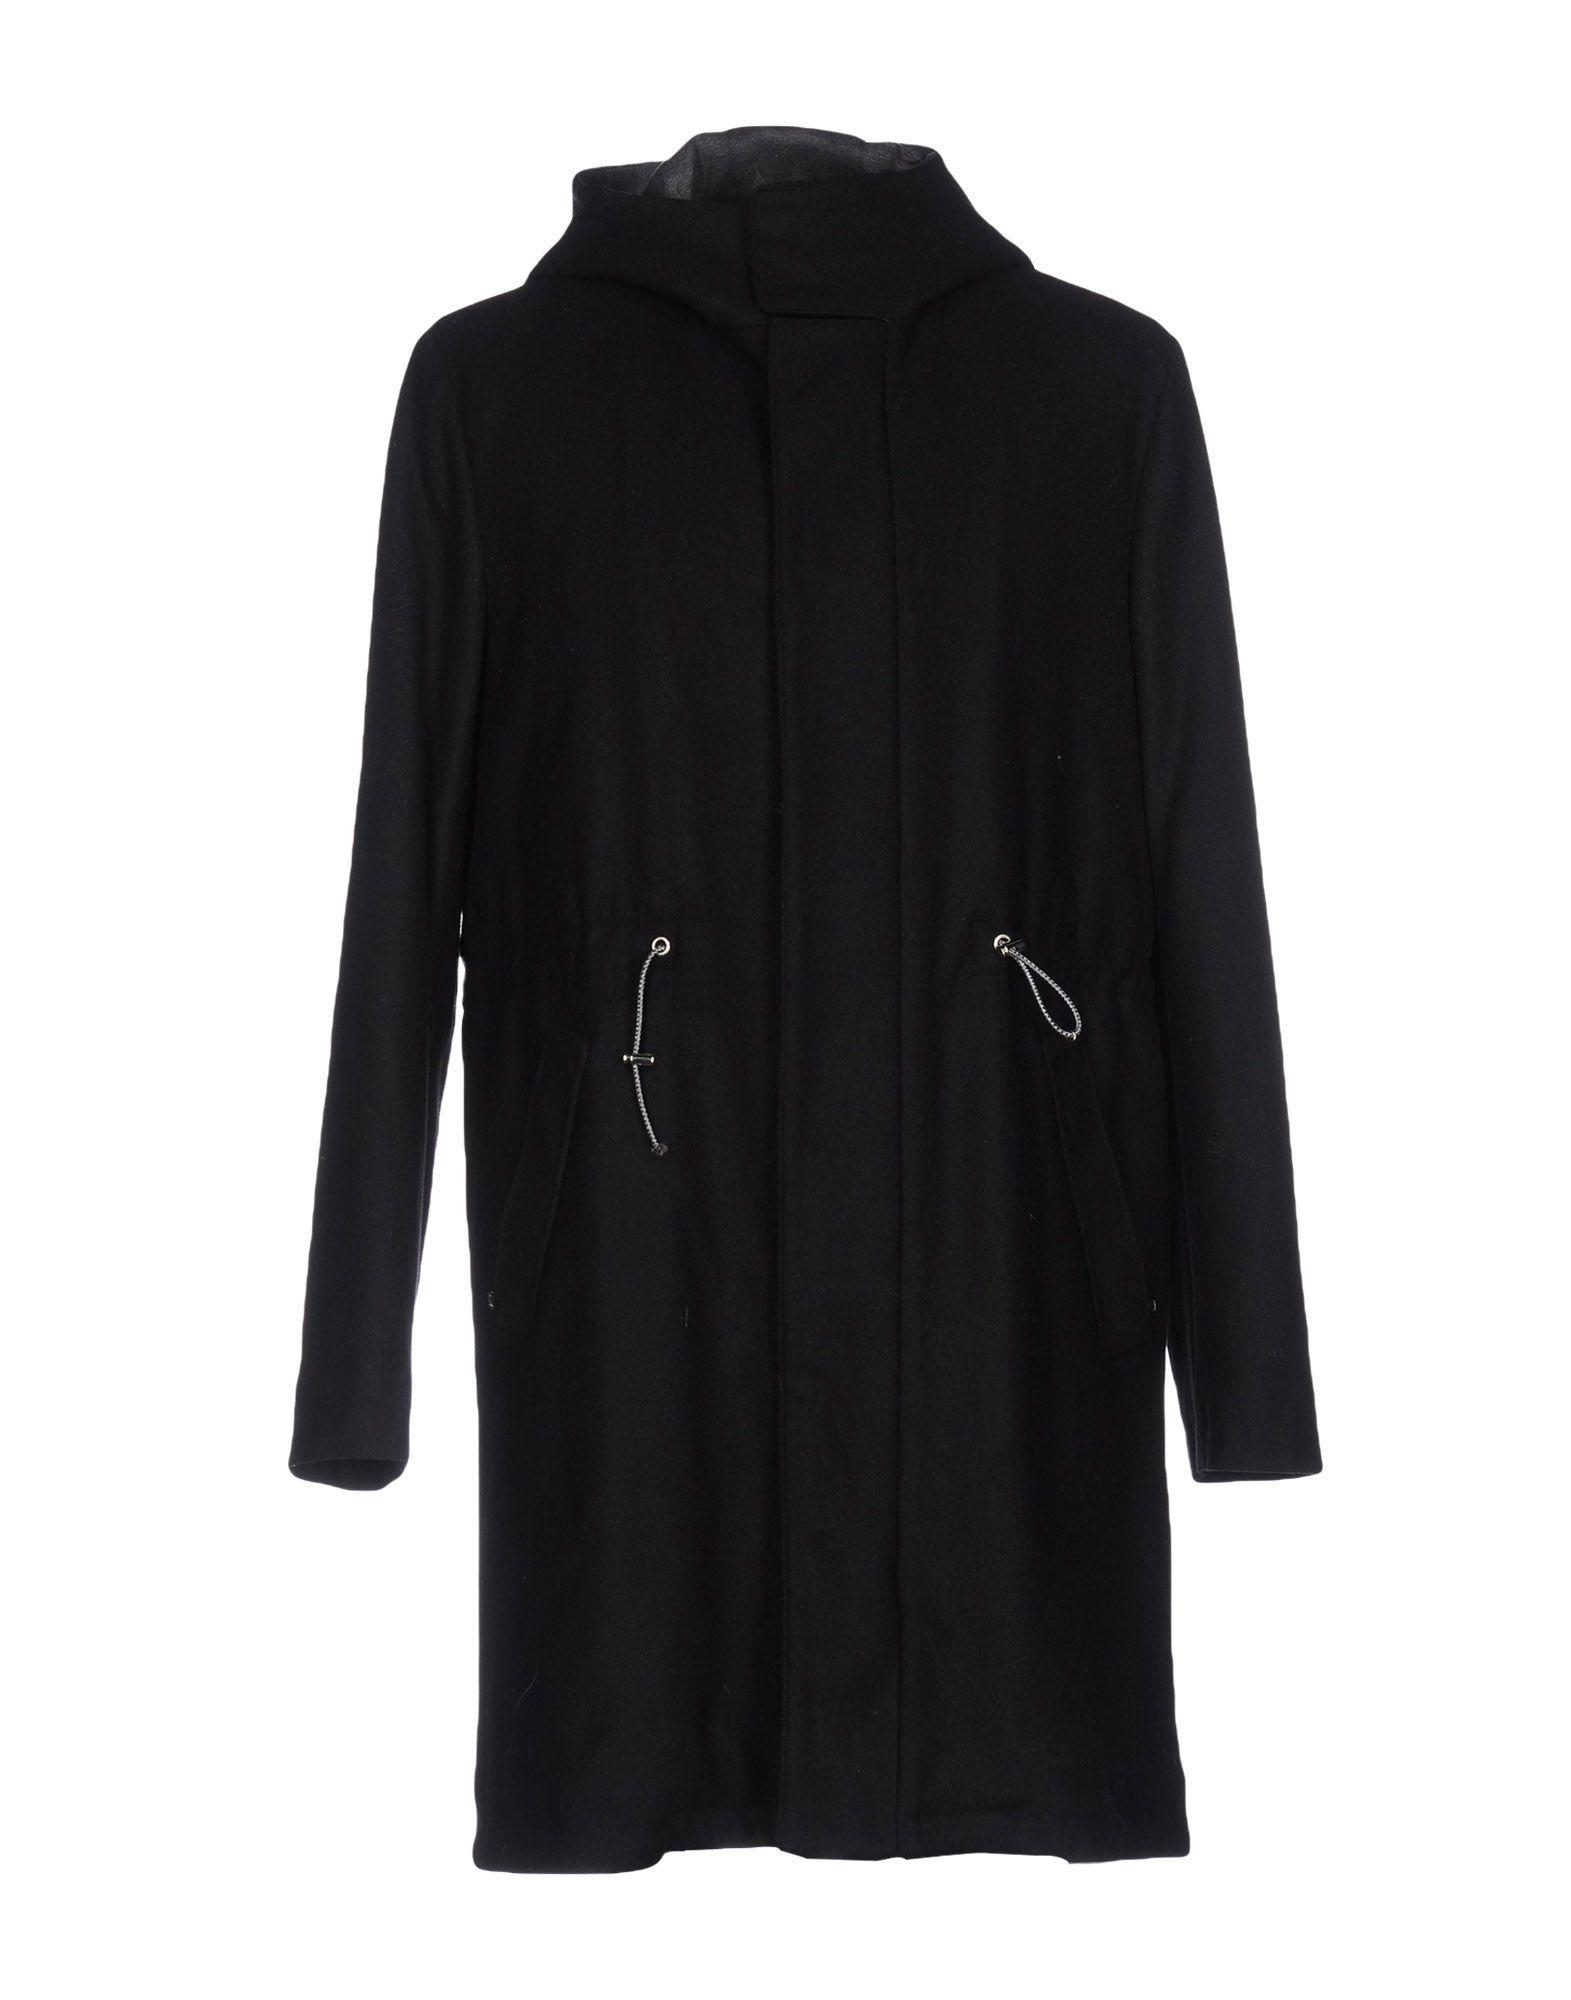 Paolo Pecora Coats In Black